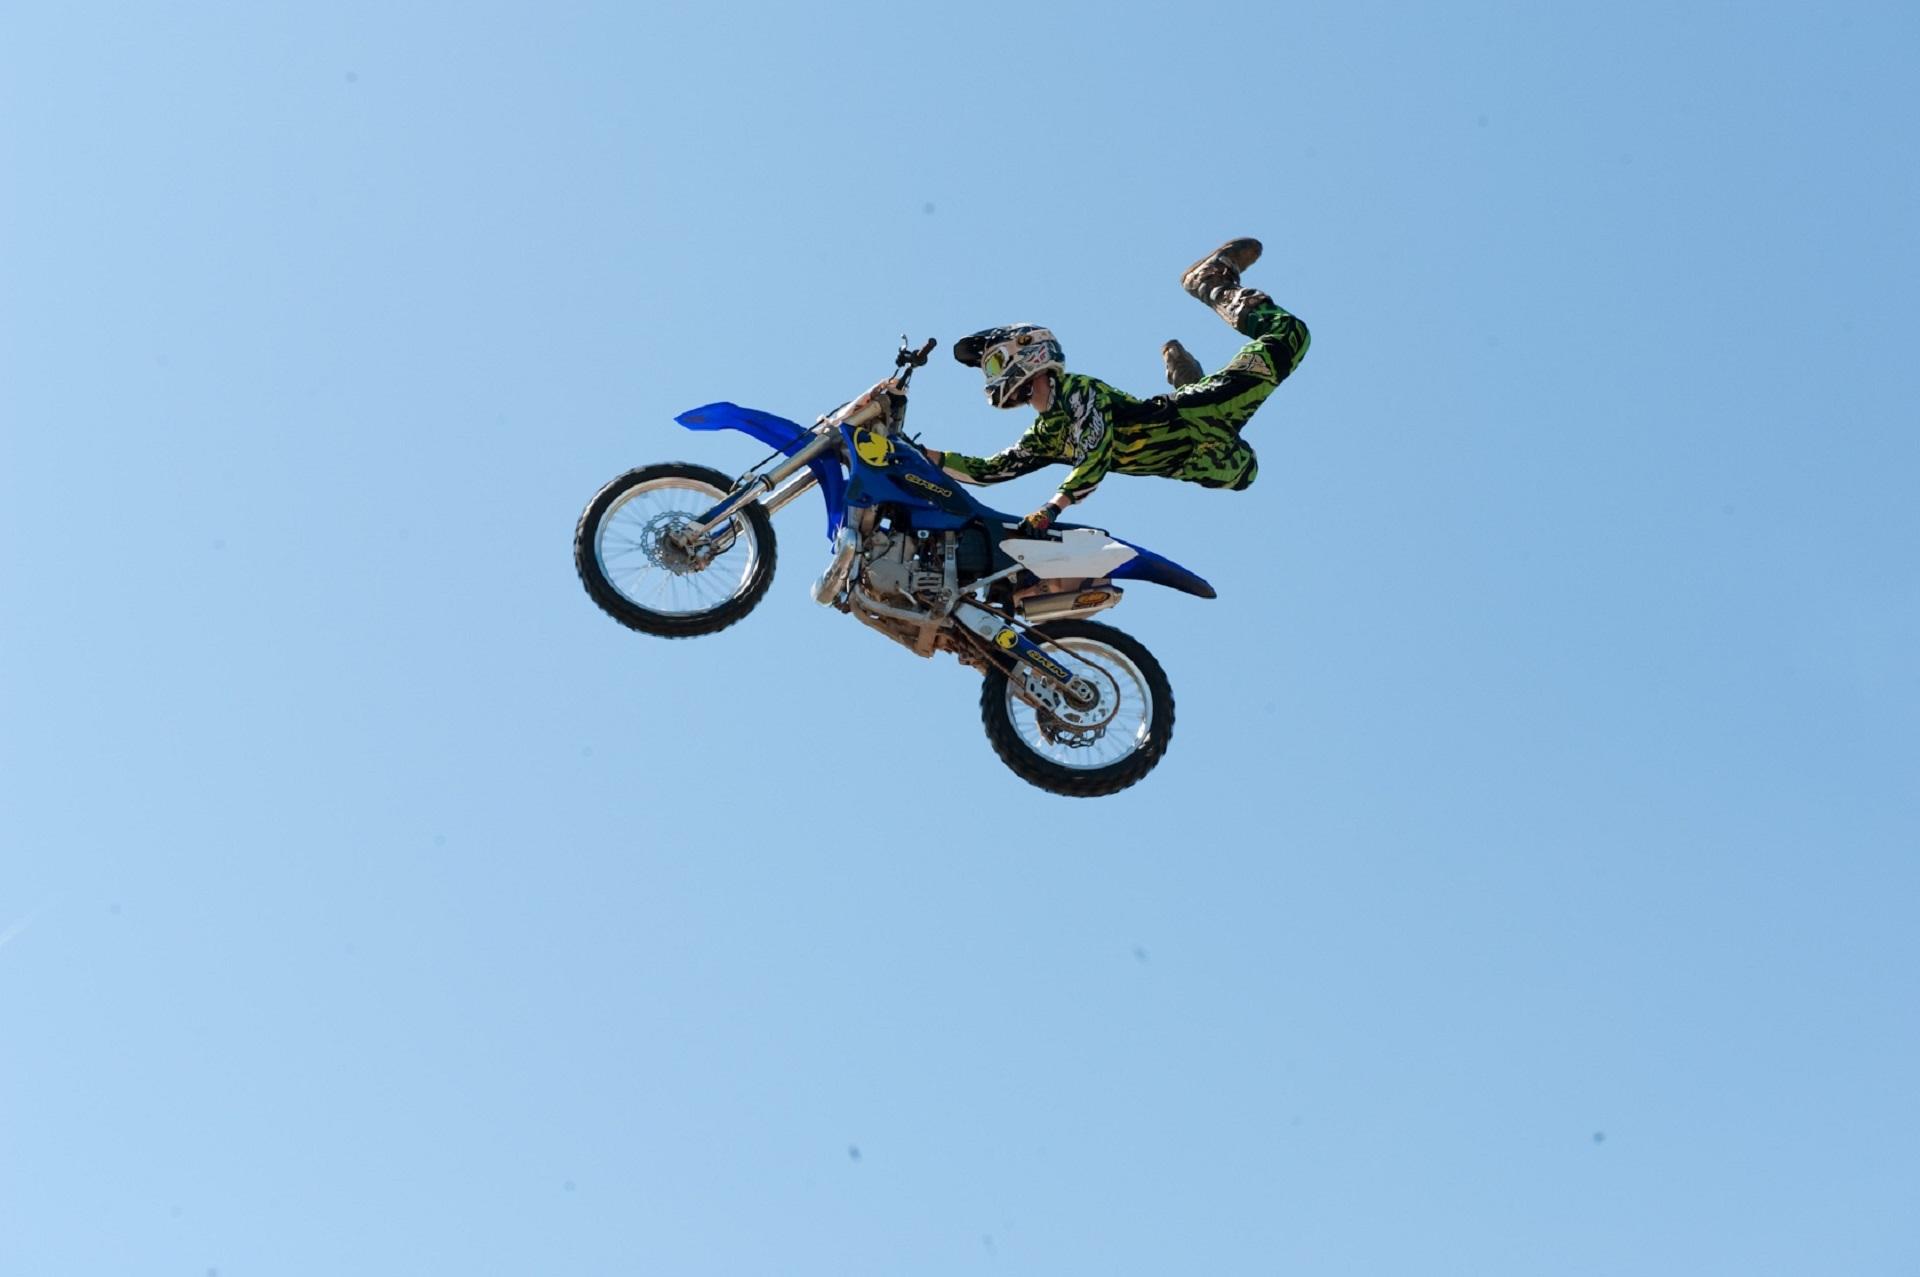 Bike jumping photo